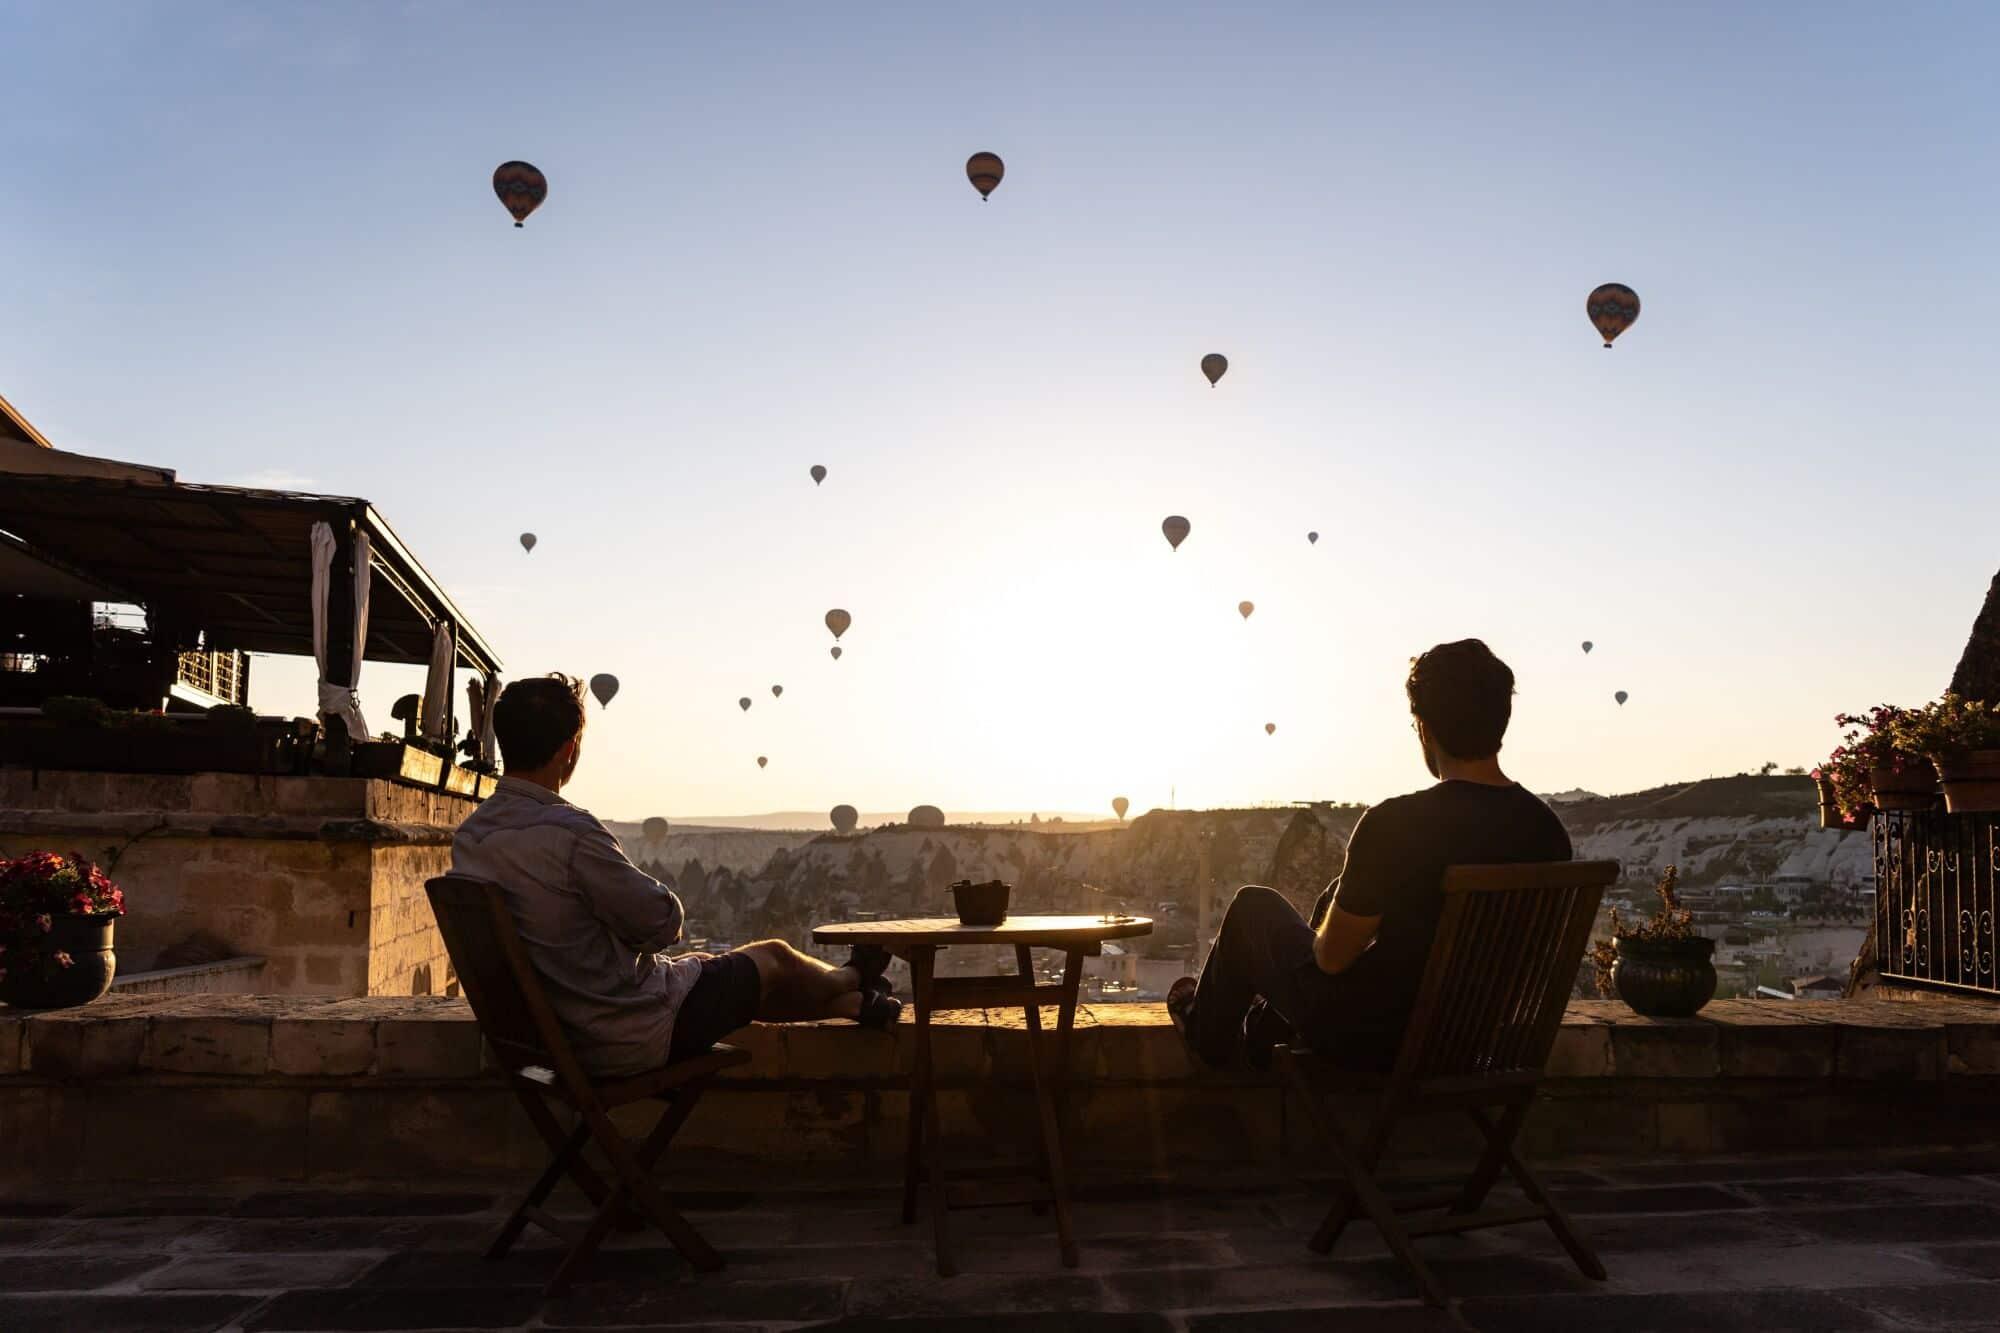 Travis Bluemling in Cappadocia, Turkey